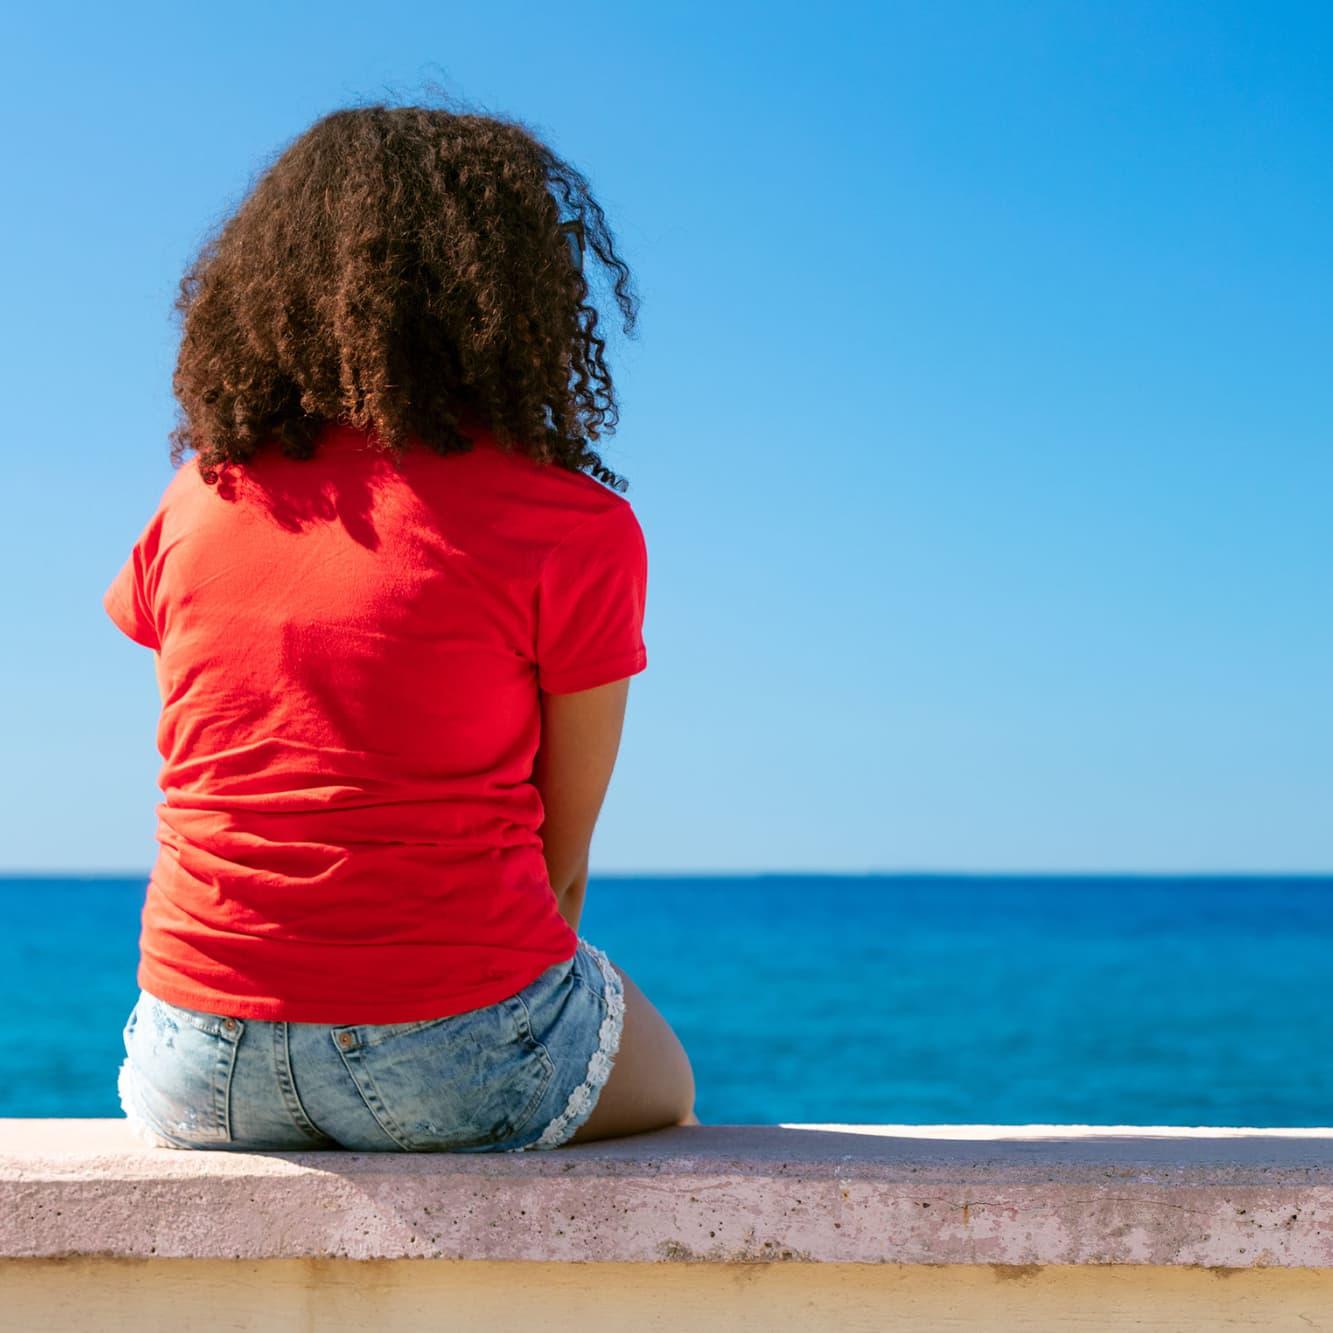 A woman sits on a wall alone near the sea.